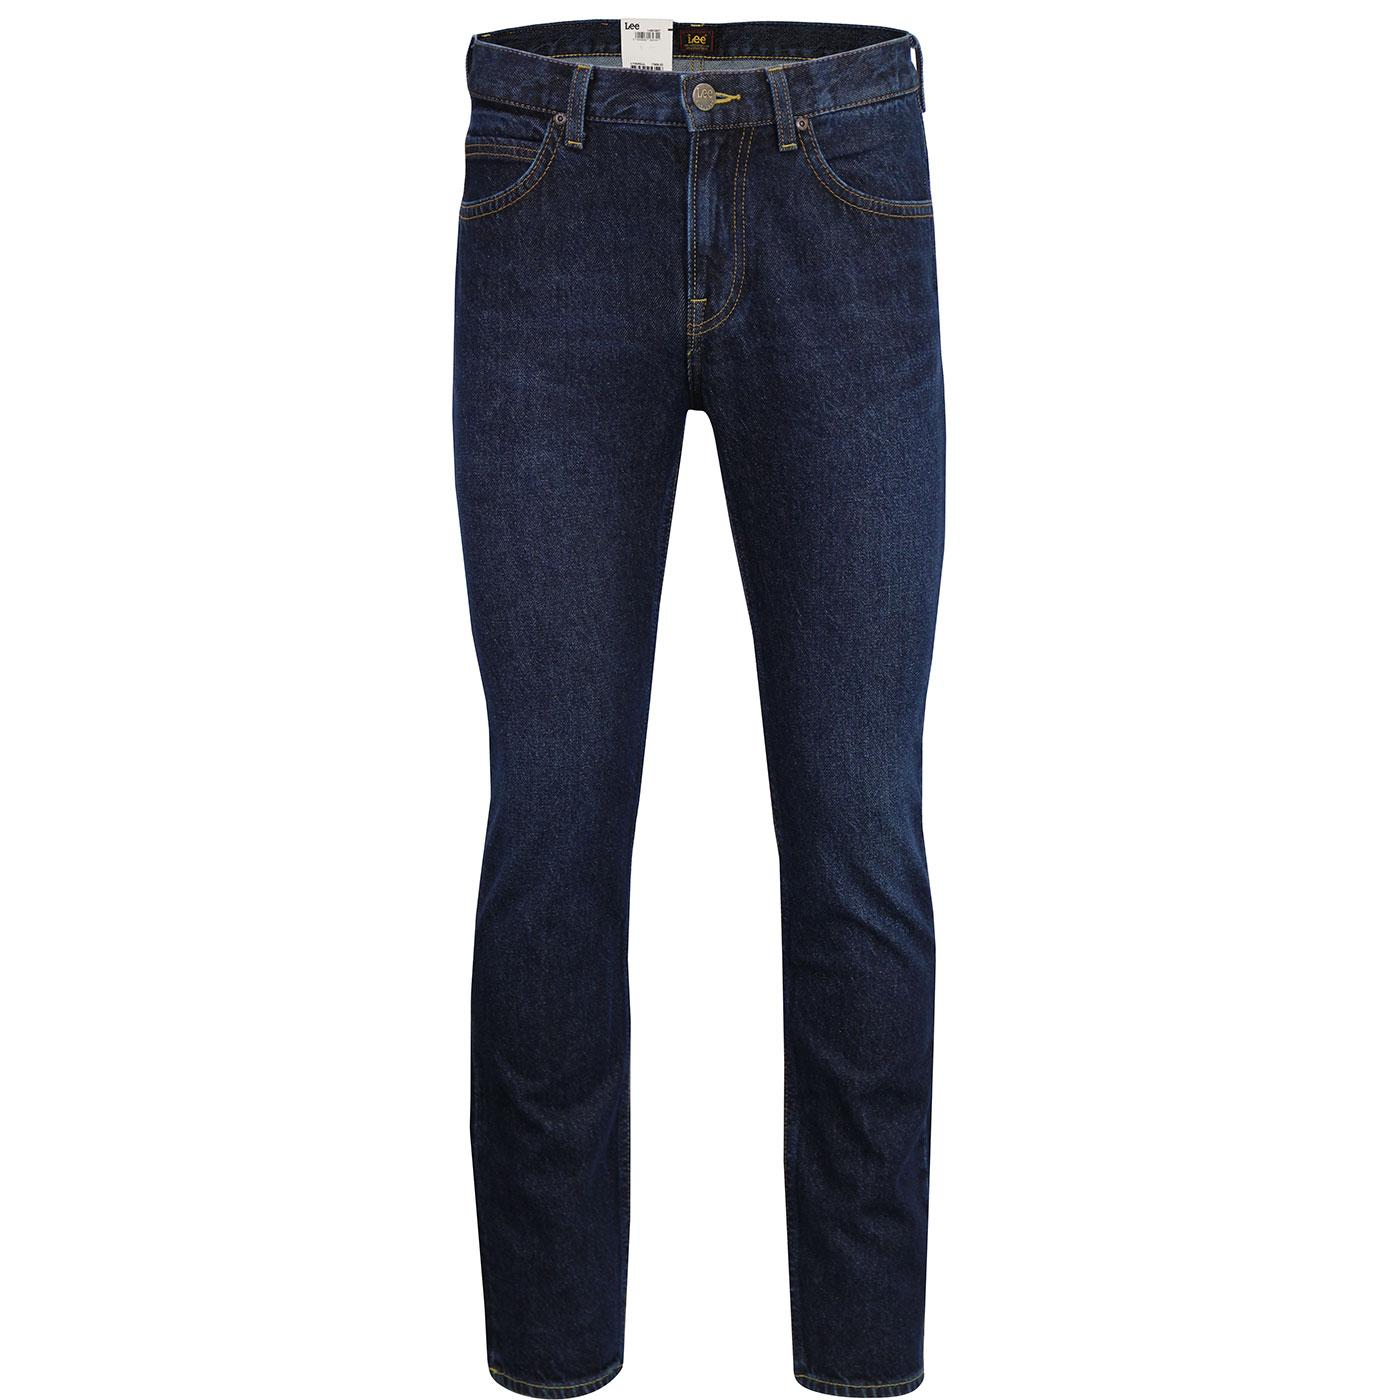 Rider LEE Slim Leg Retro Dark Buck Denim Jeans